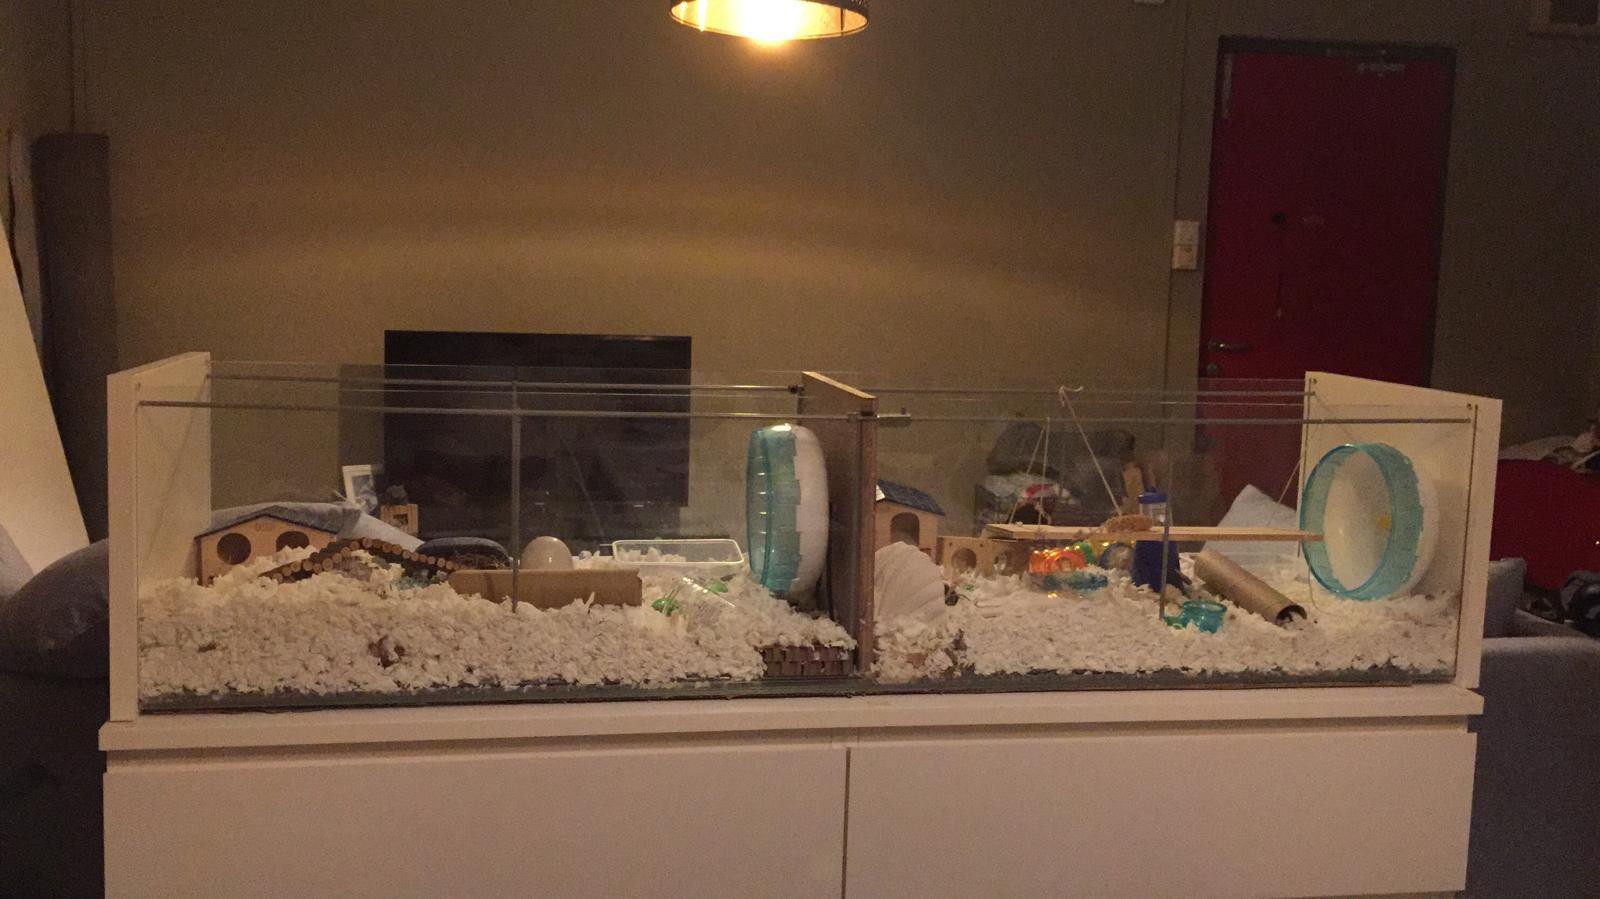 Hamster Cages Part I